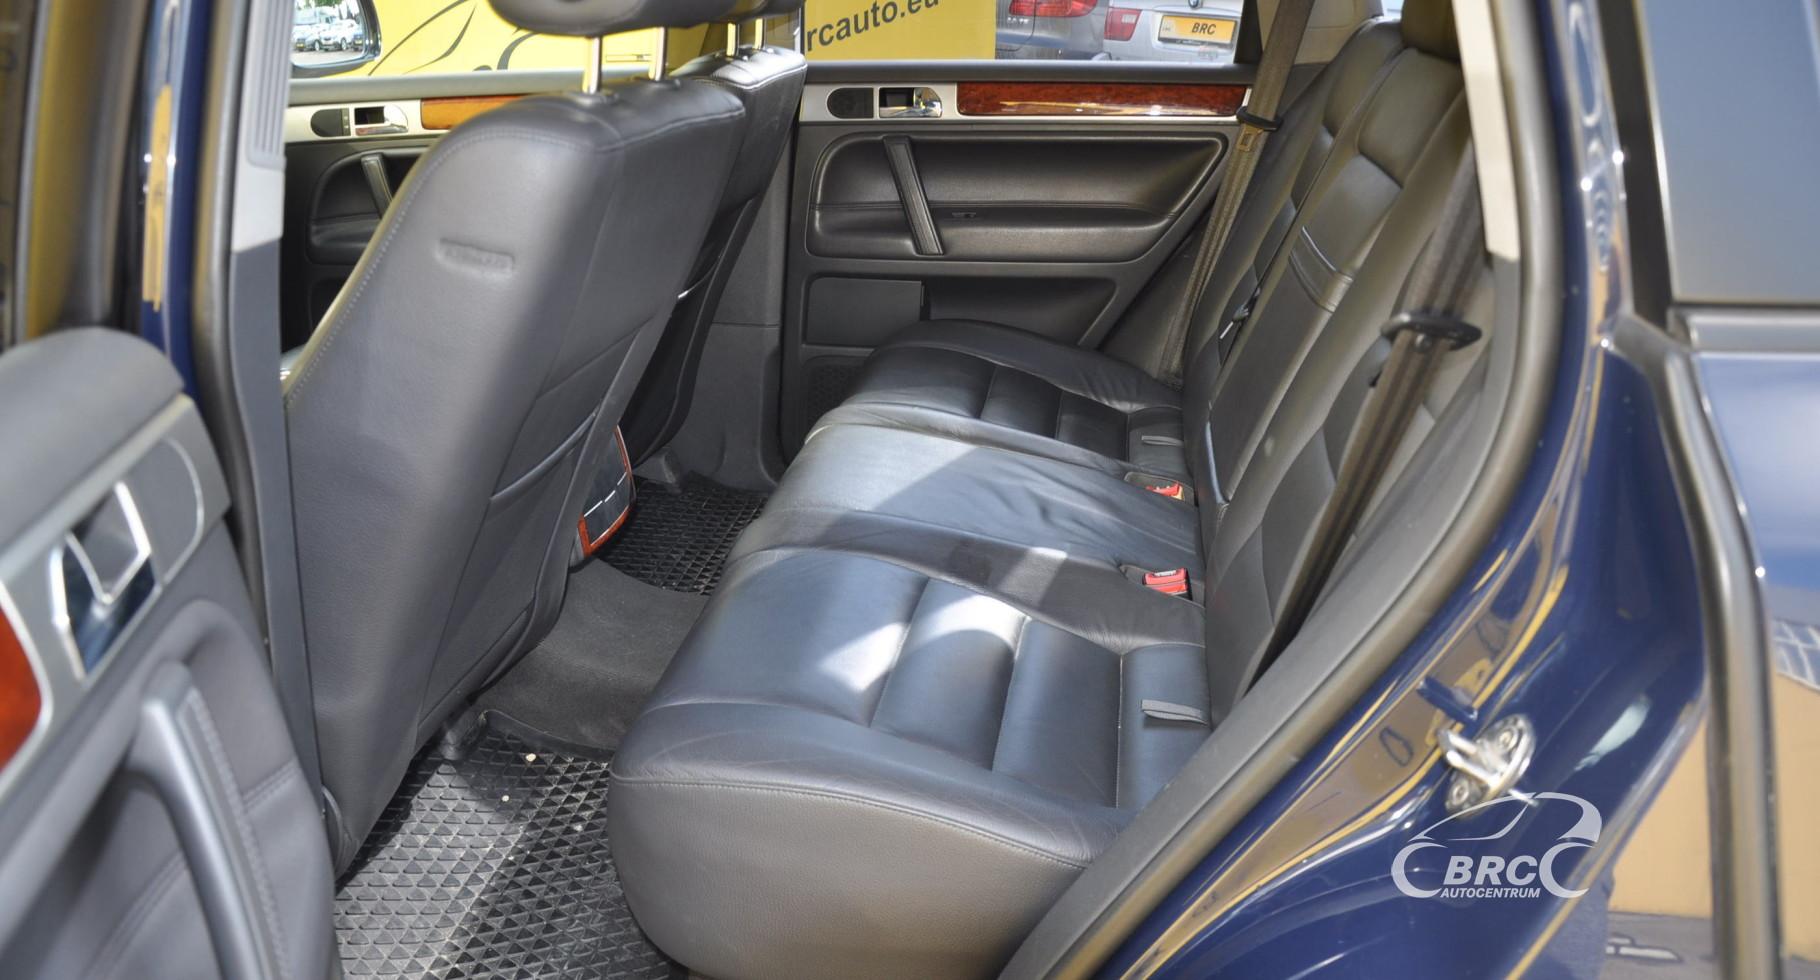 Volkswagen Touareg 3.0TDI V6 Automatas